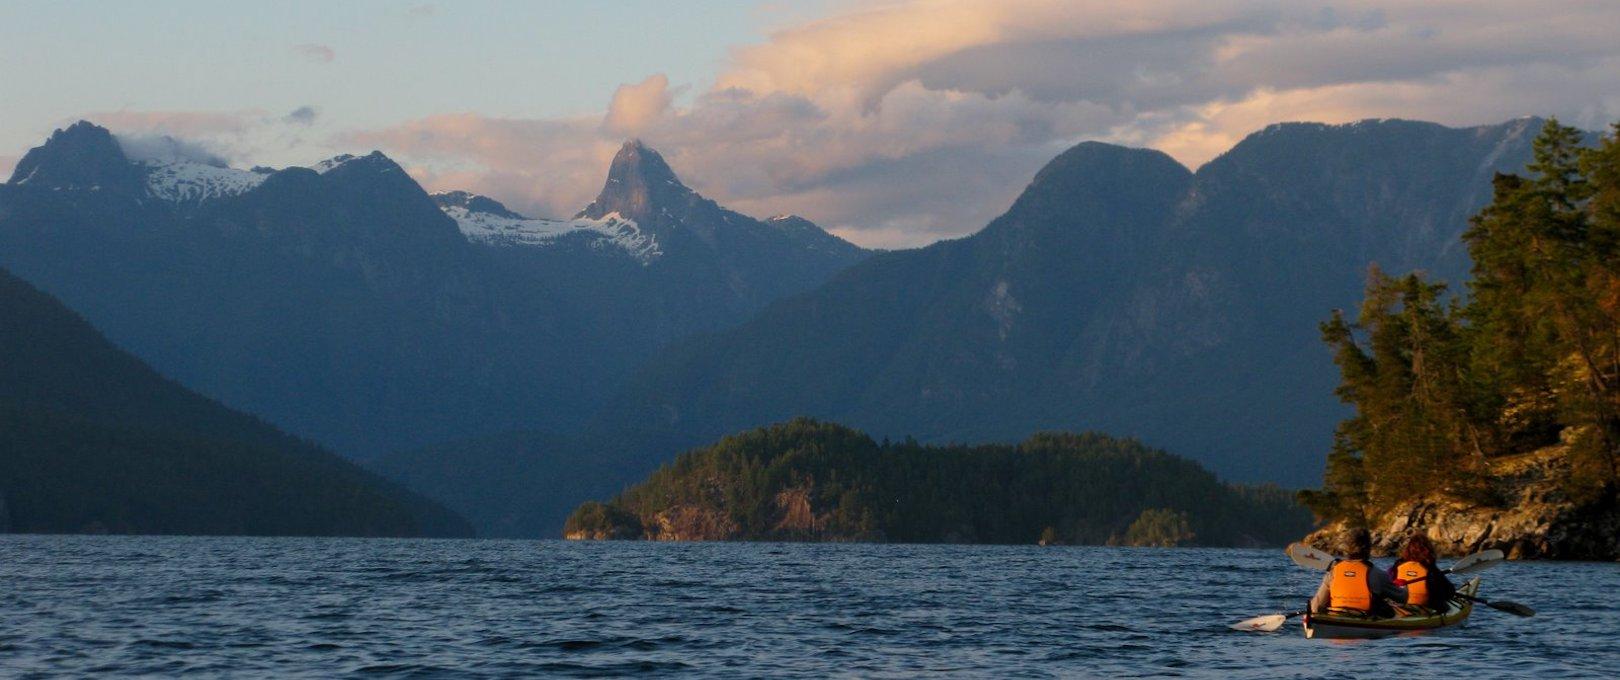 Kayak rental vancouver, the Sunshine Coast & Powell River for Desolation Sound